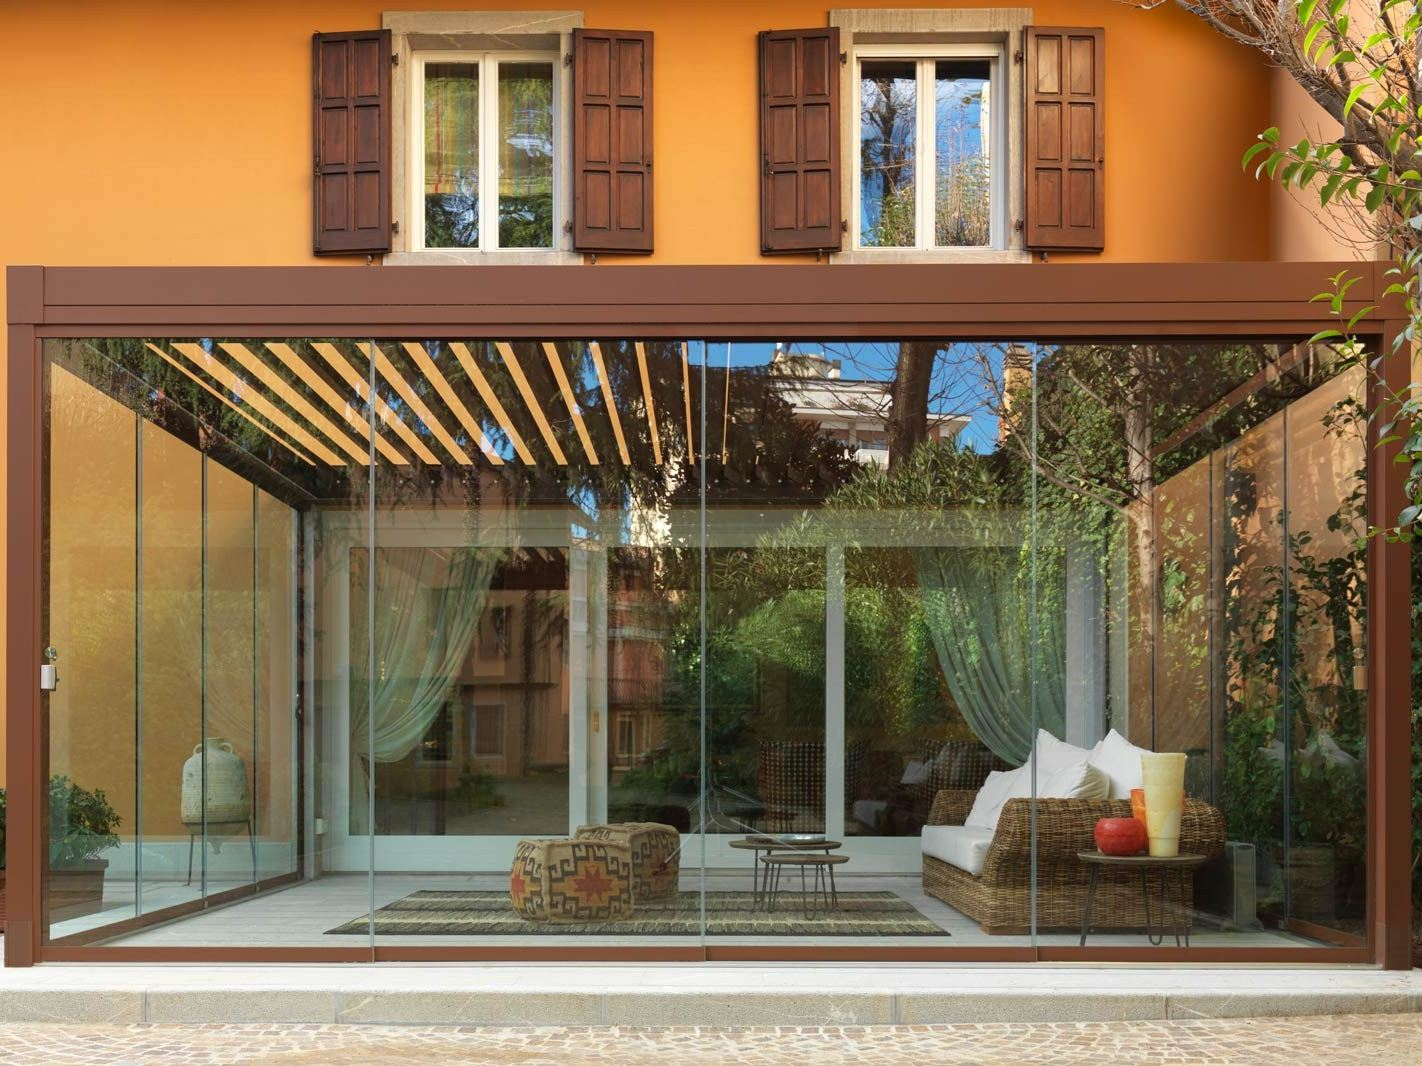 Giardino d 39 inverno con porte scorrevoli slide glass by - Giardino d inverno ...